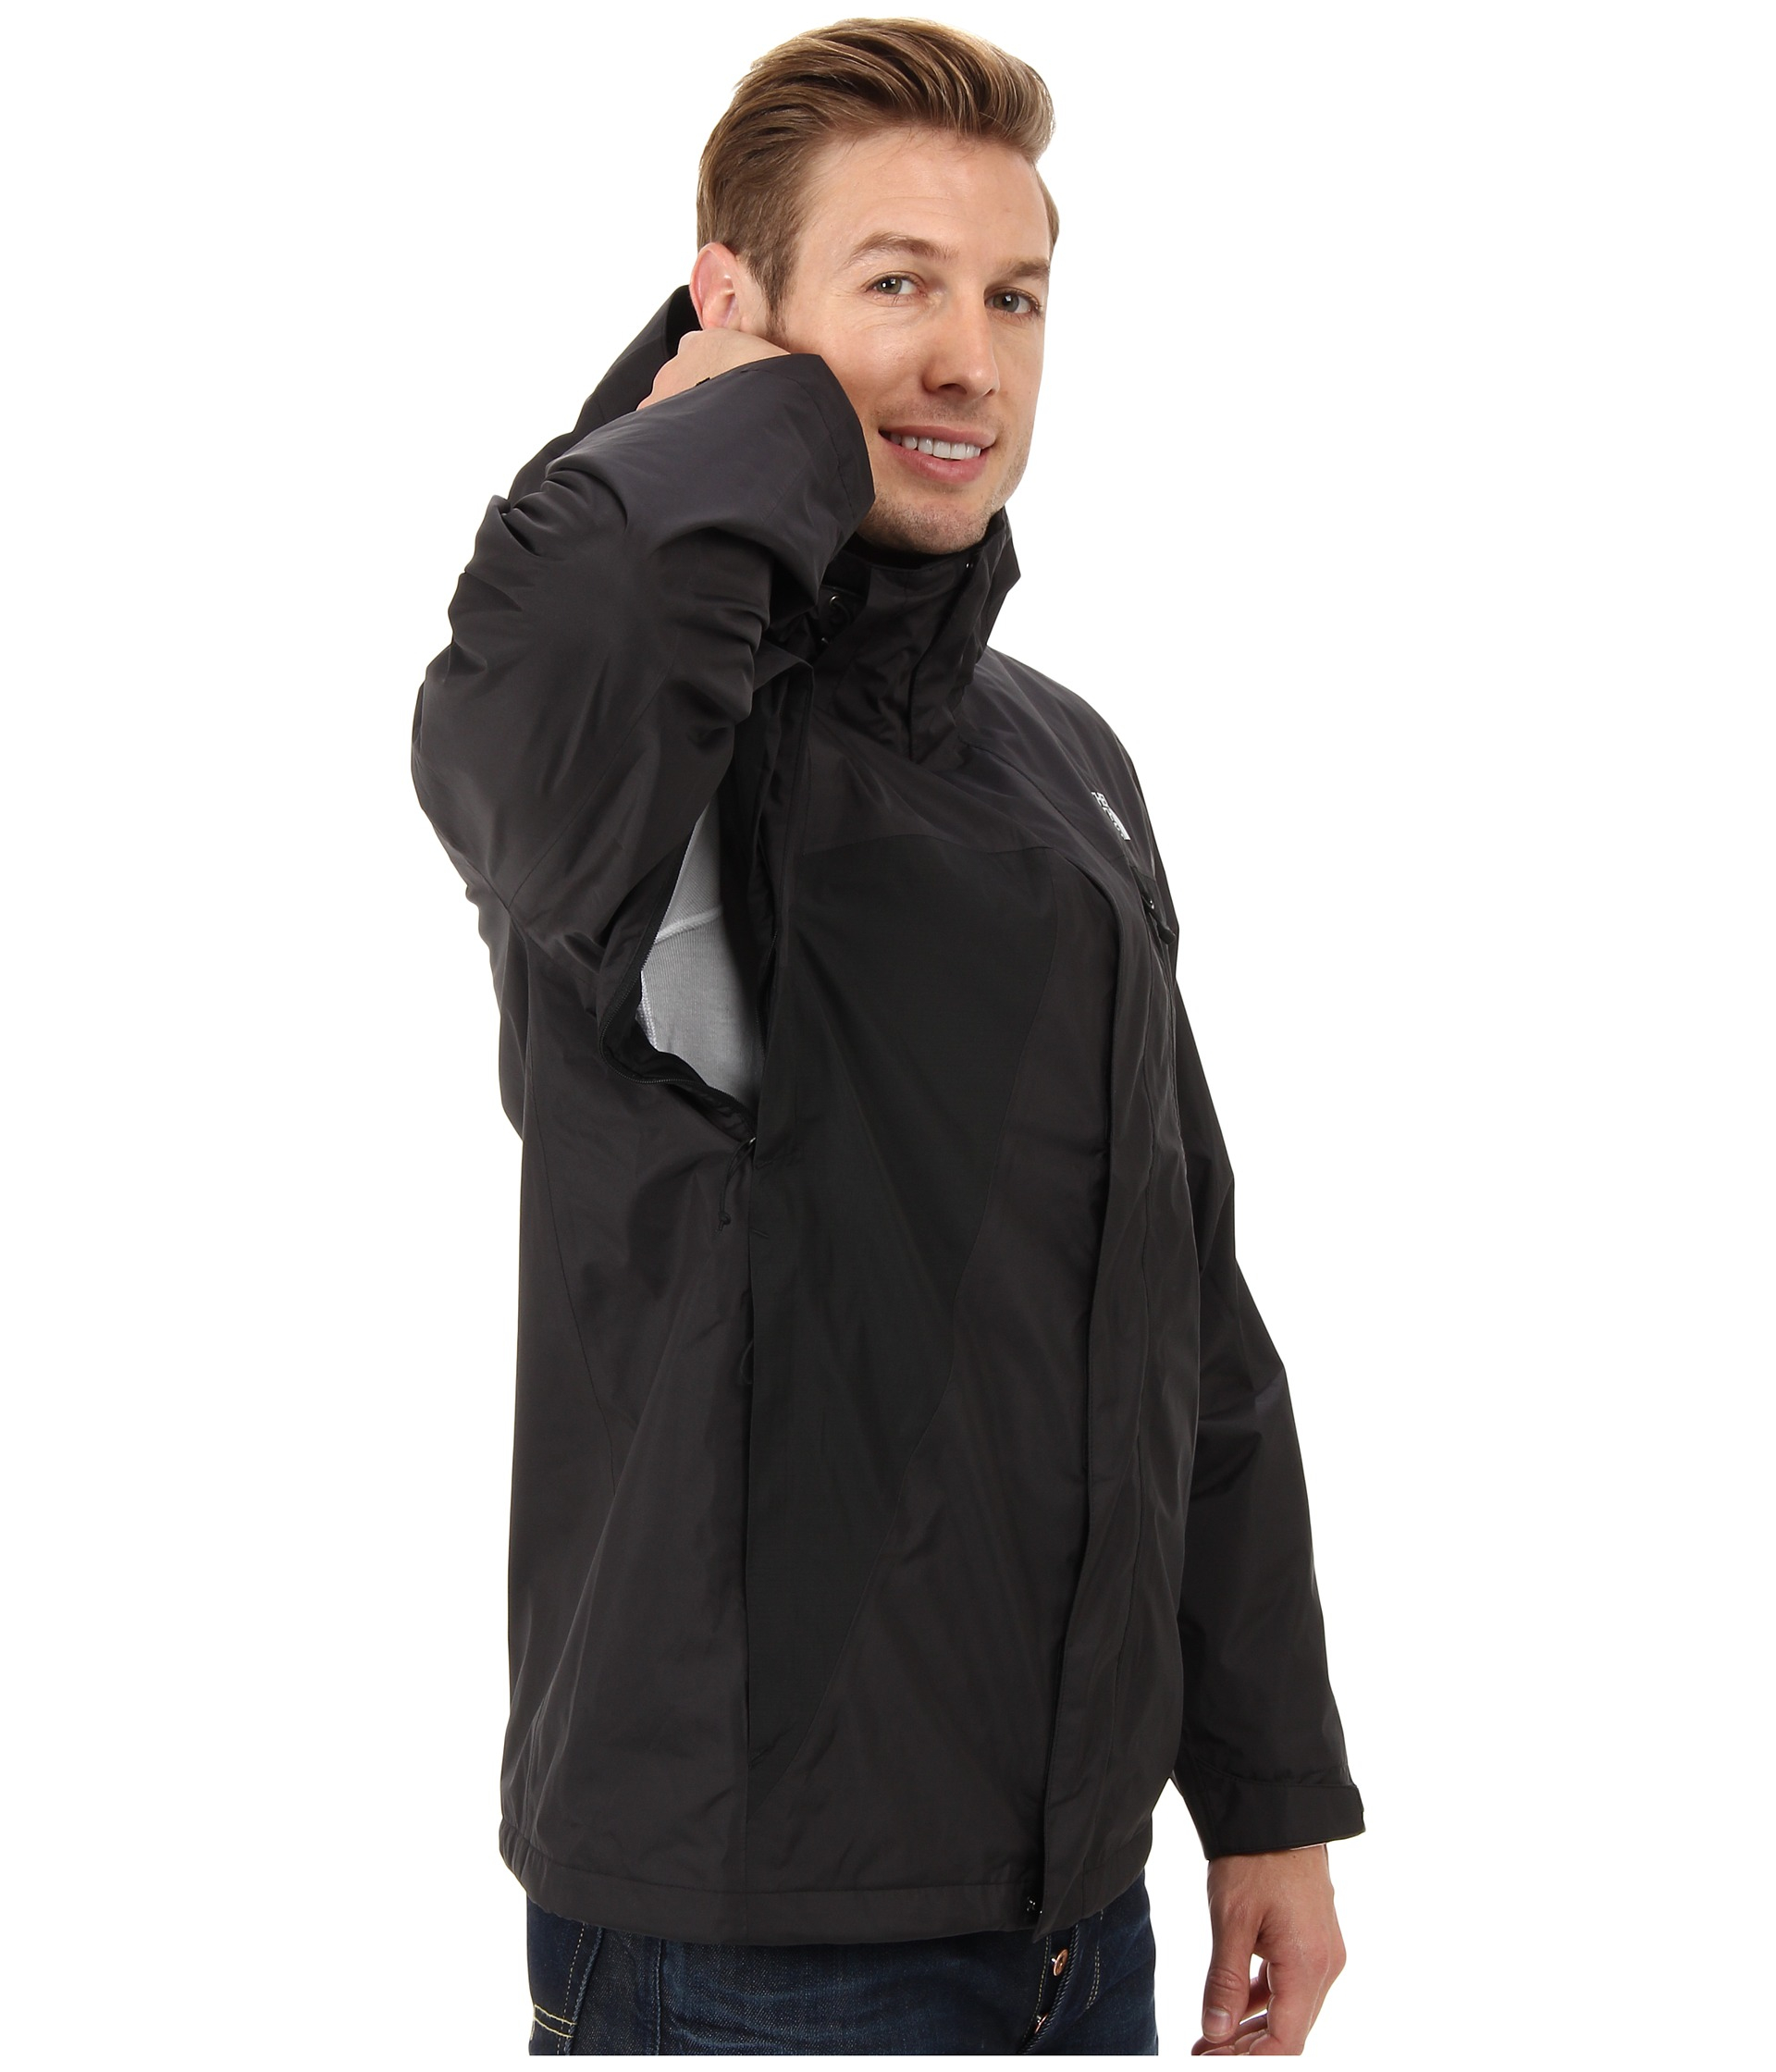 the north face mountain light jacket in black for men tnf black tnf. Black Bedroom Furniture Sets. Home Design Ideas